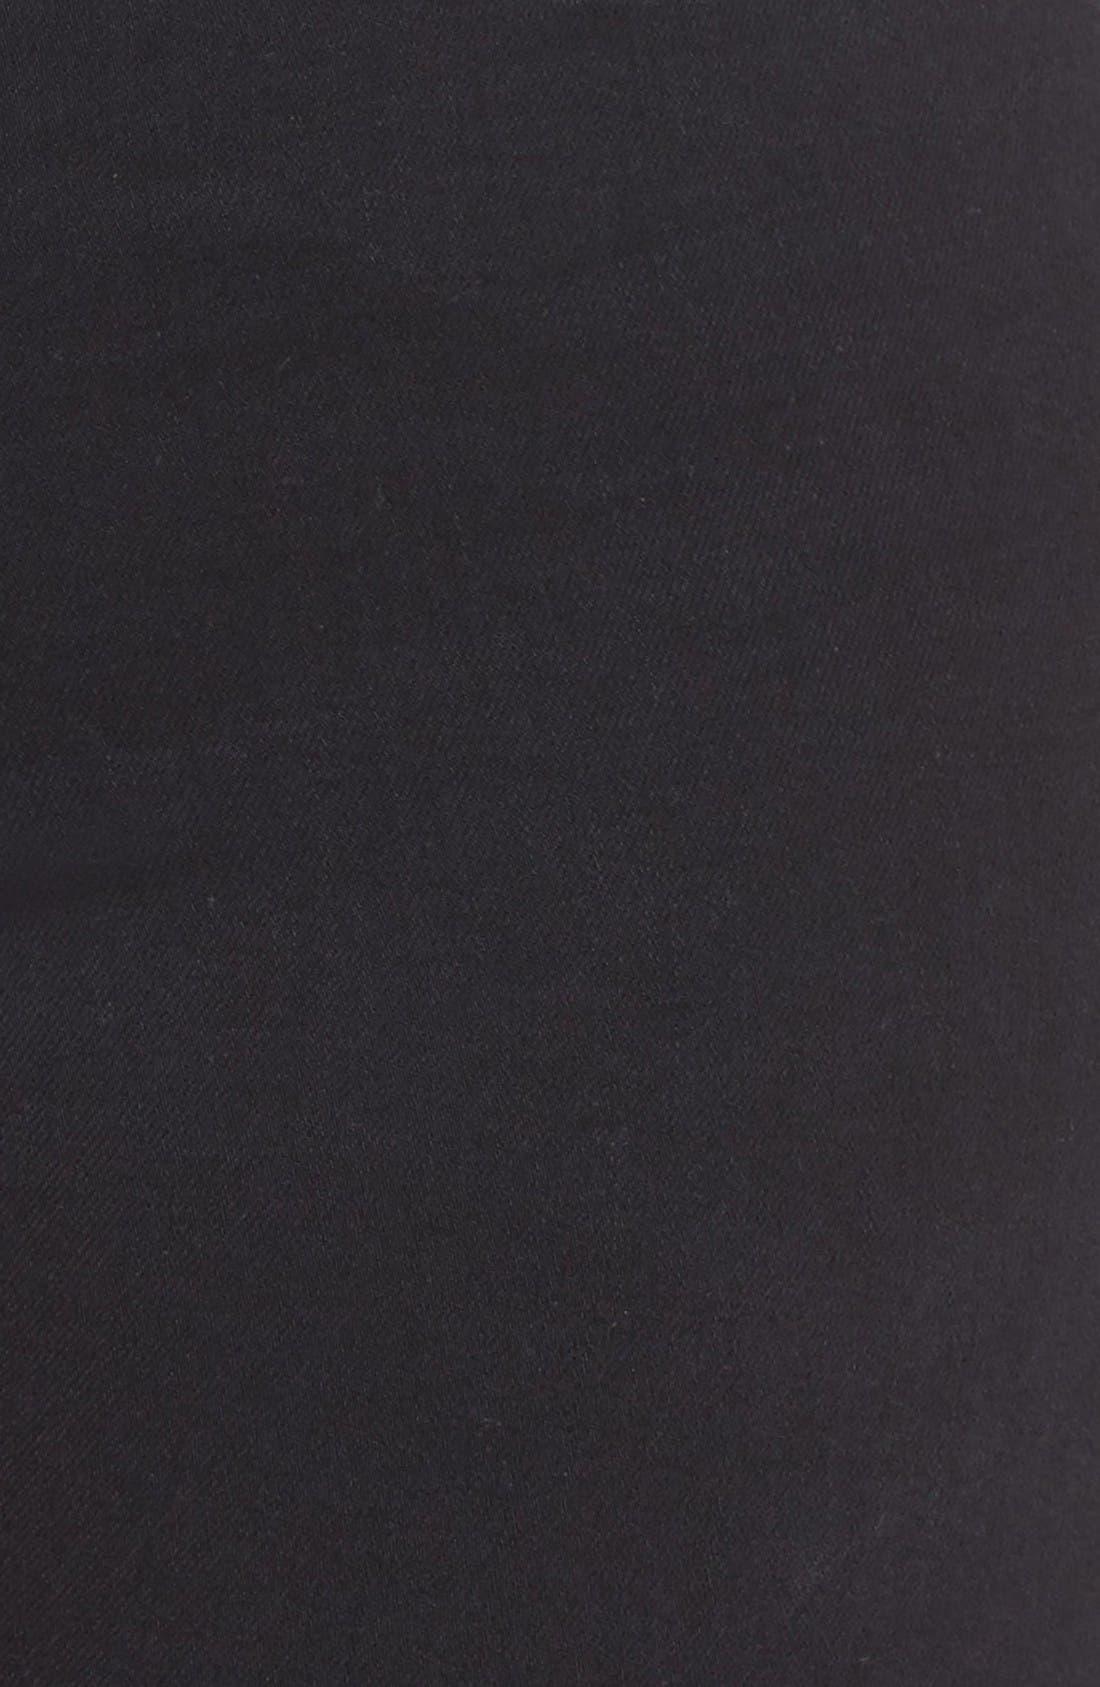 Good Waist High Rise Skinny Jeans,                             Alternate thumbnail 11, color,                             Black 004